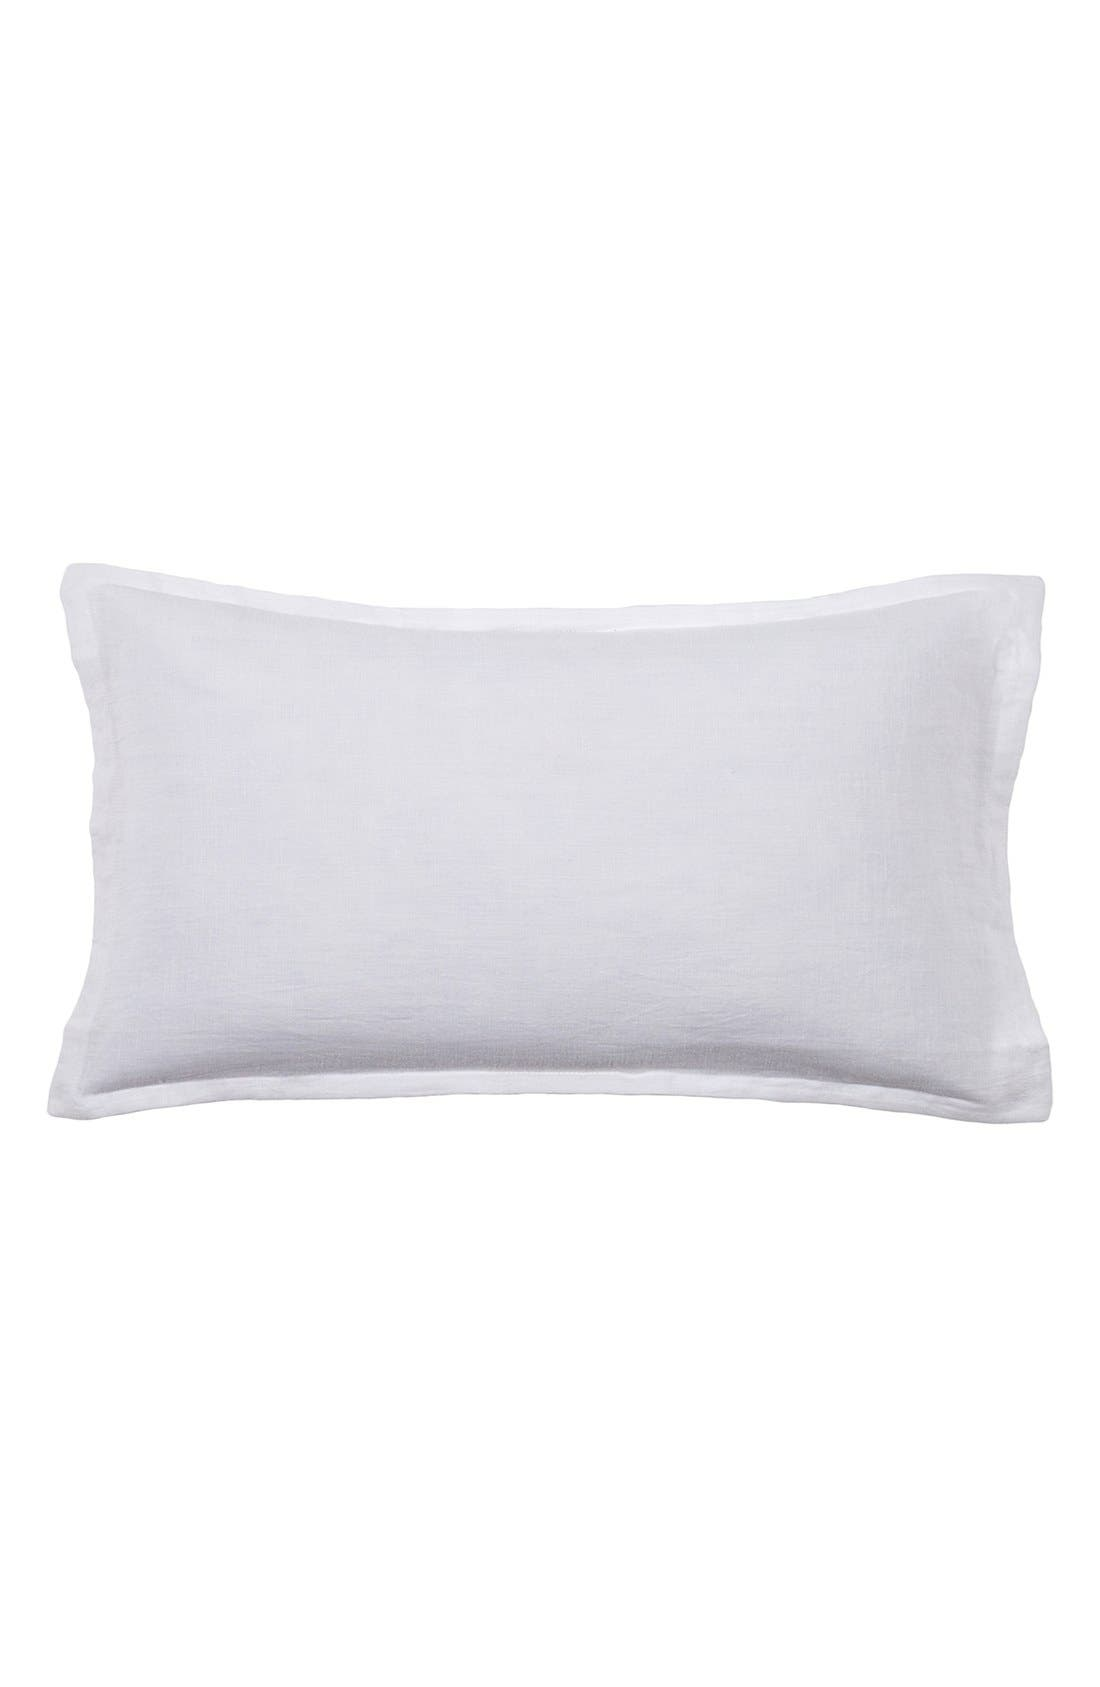 Main Image - PomPomat Home 'Louwie' Pillow